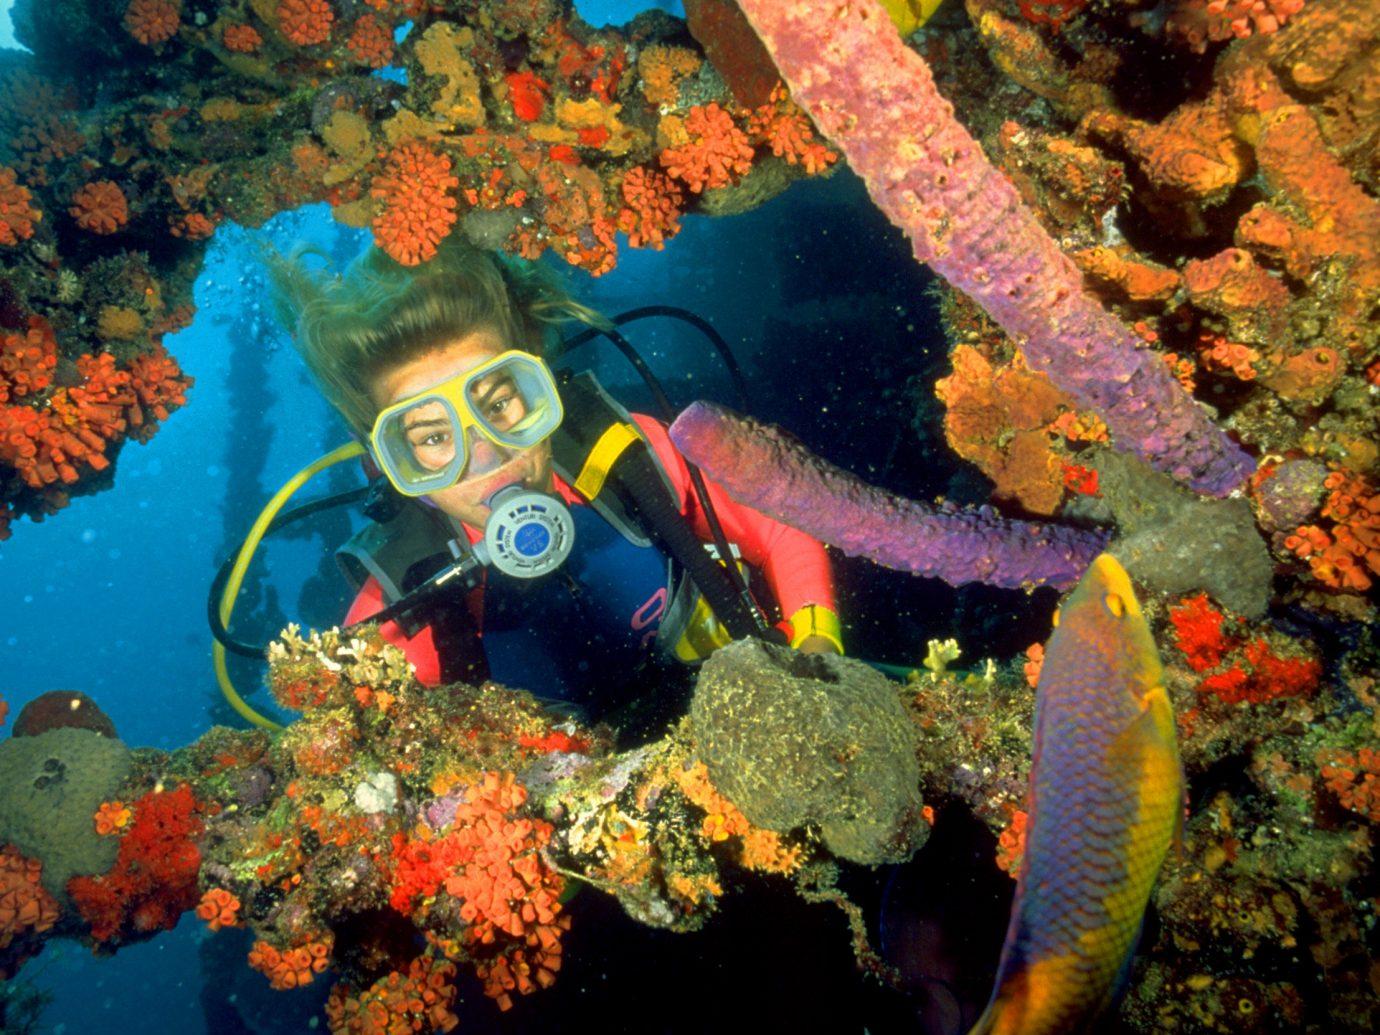 Trip Ideas habitat coral reef reef marine biology coral reef fish natural environment biology water sport underwater coral fish swimming pomacentridae invertebrate aquarium plant colorful colored ocean floor